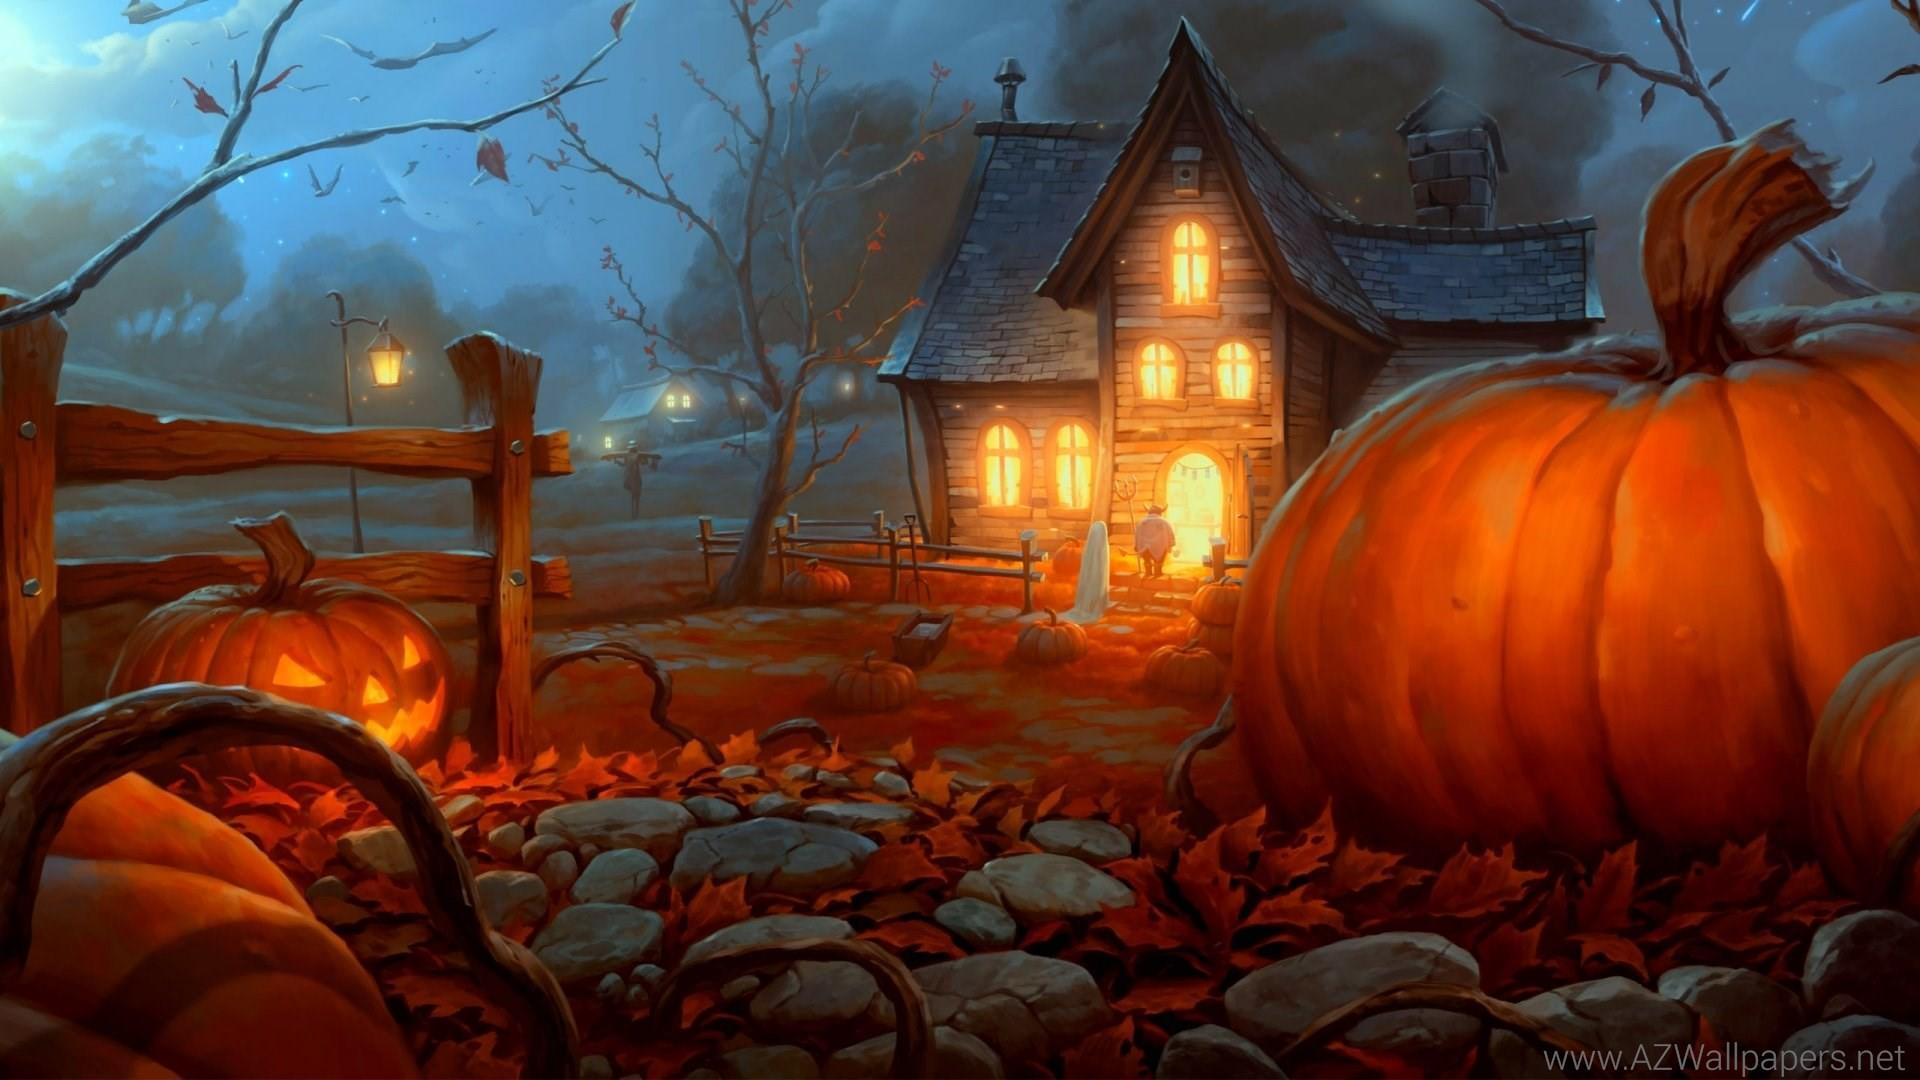 New 1000 Screensaver: Fall Free Halloween Screensaver Desktop … New 1000  Screensaver Fall Free Halloween Screensaver Desktop